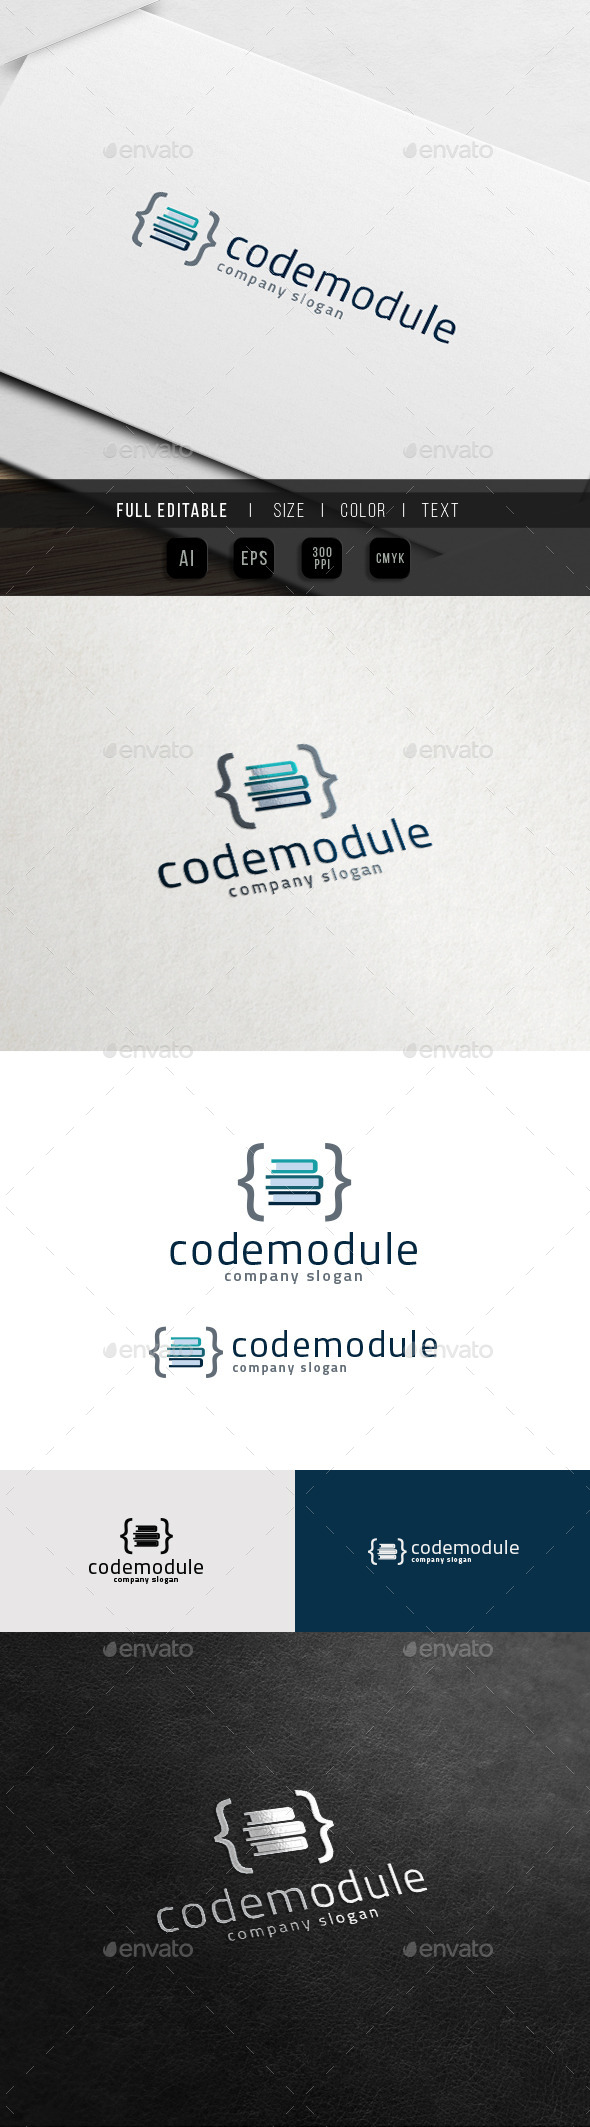 Coding Tutorial - Website Online Course Logo - Symbols Logo Templates